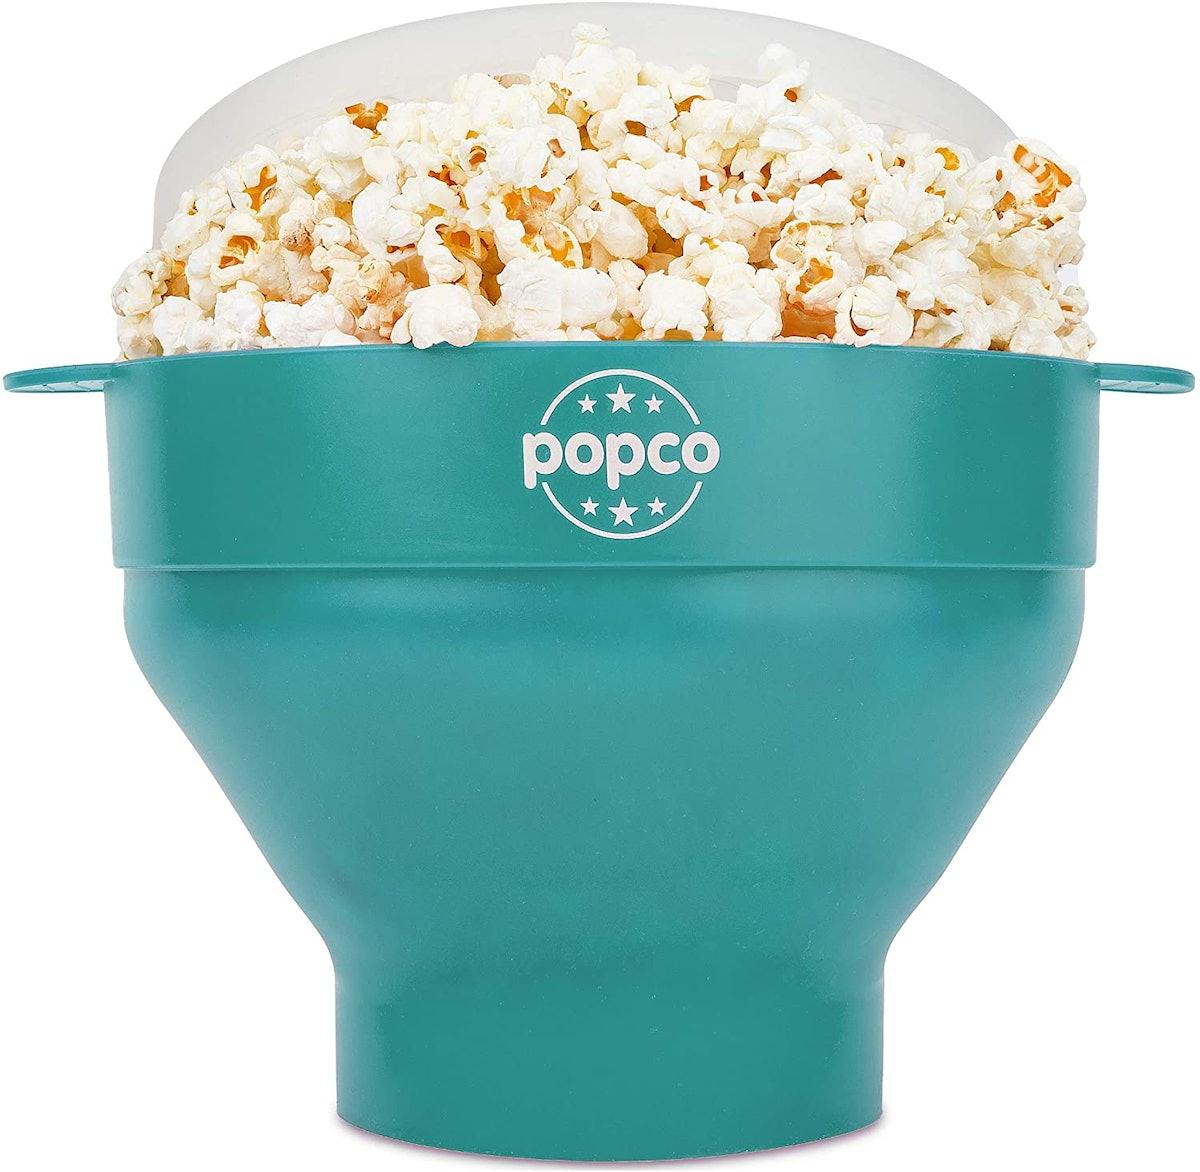 Popco Silicone Microwave Popcorn Popper